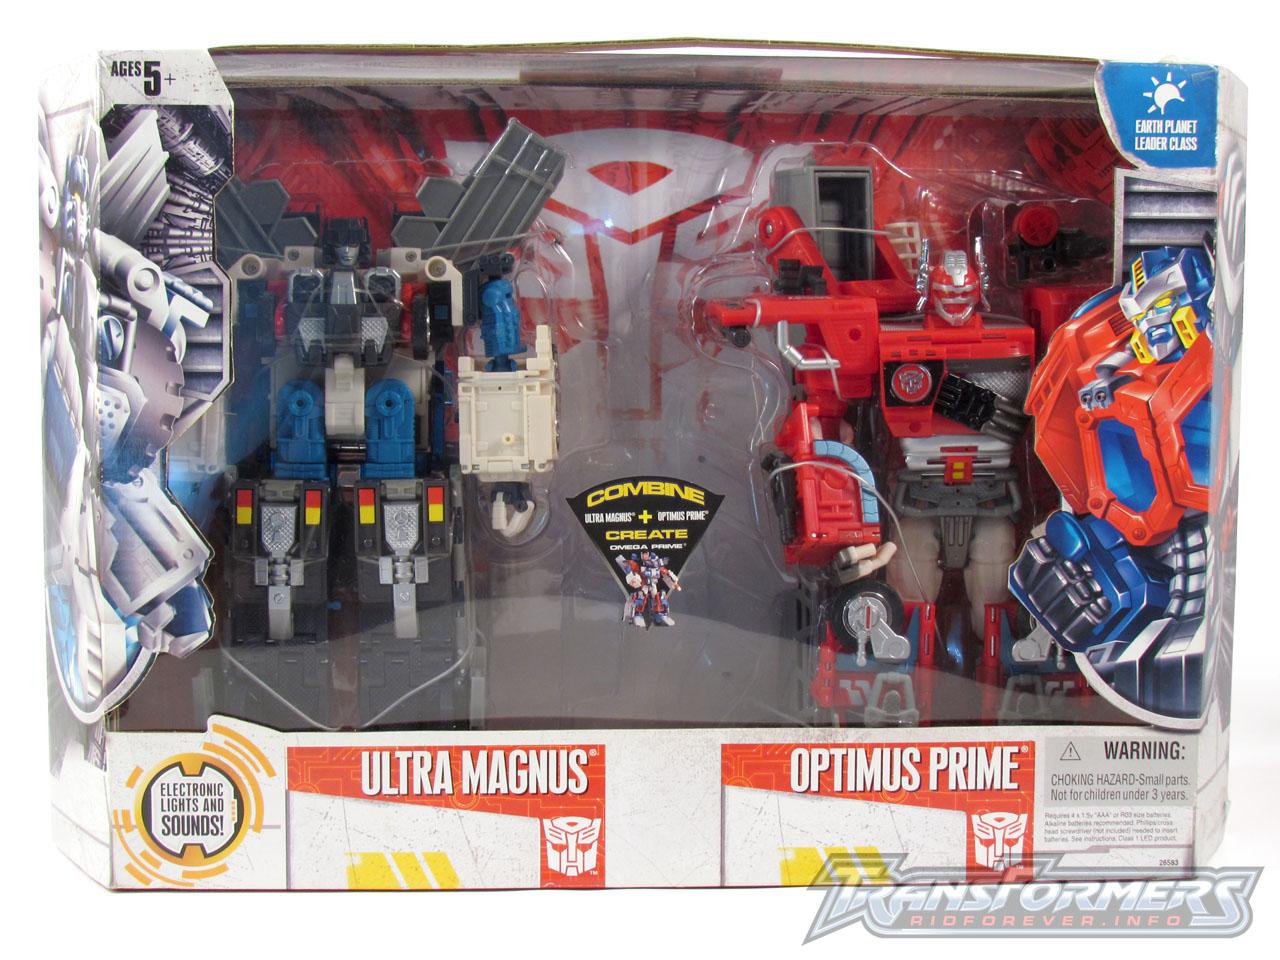 Cybertron-Omega-Prime-001